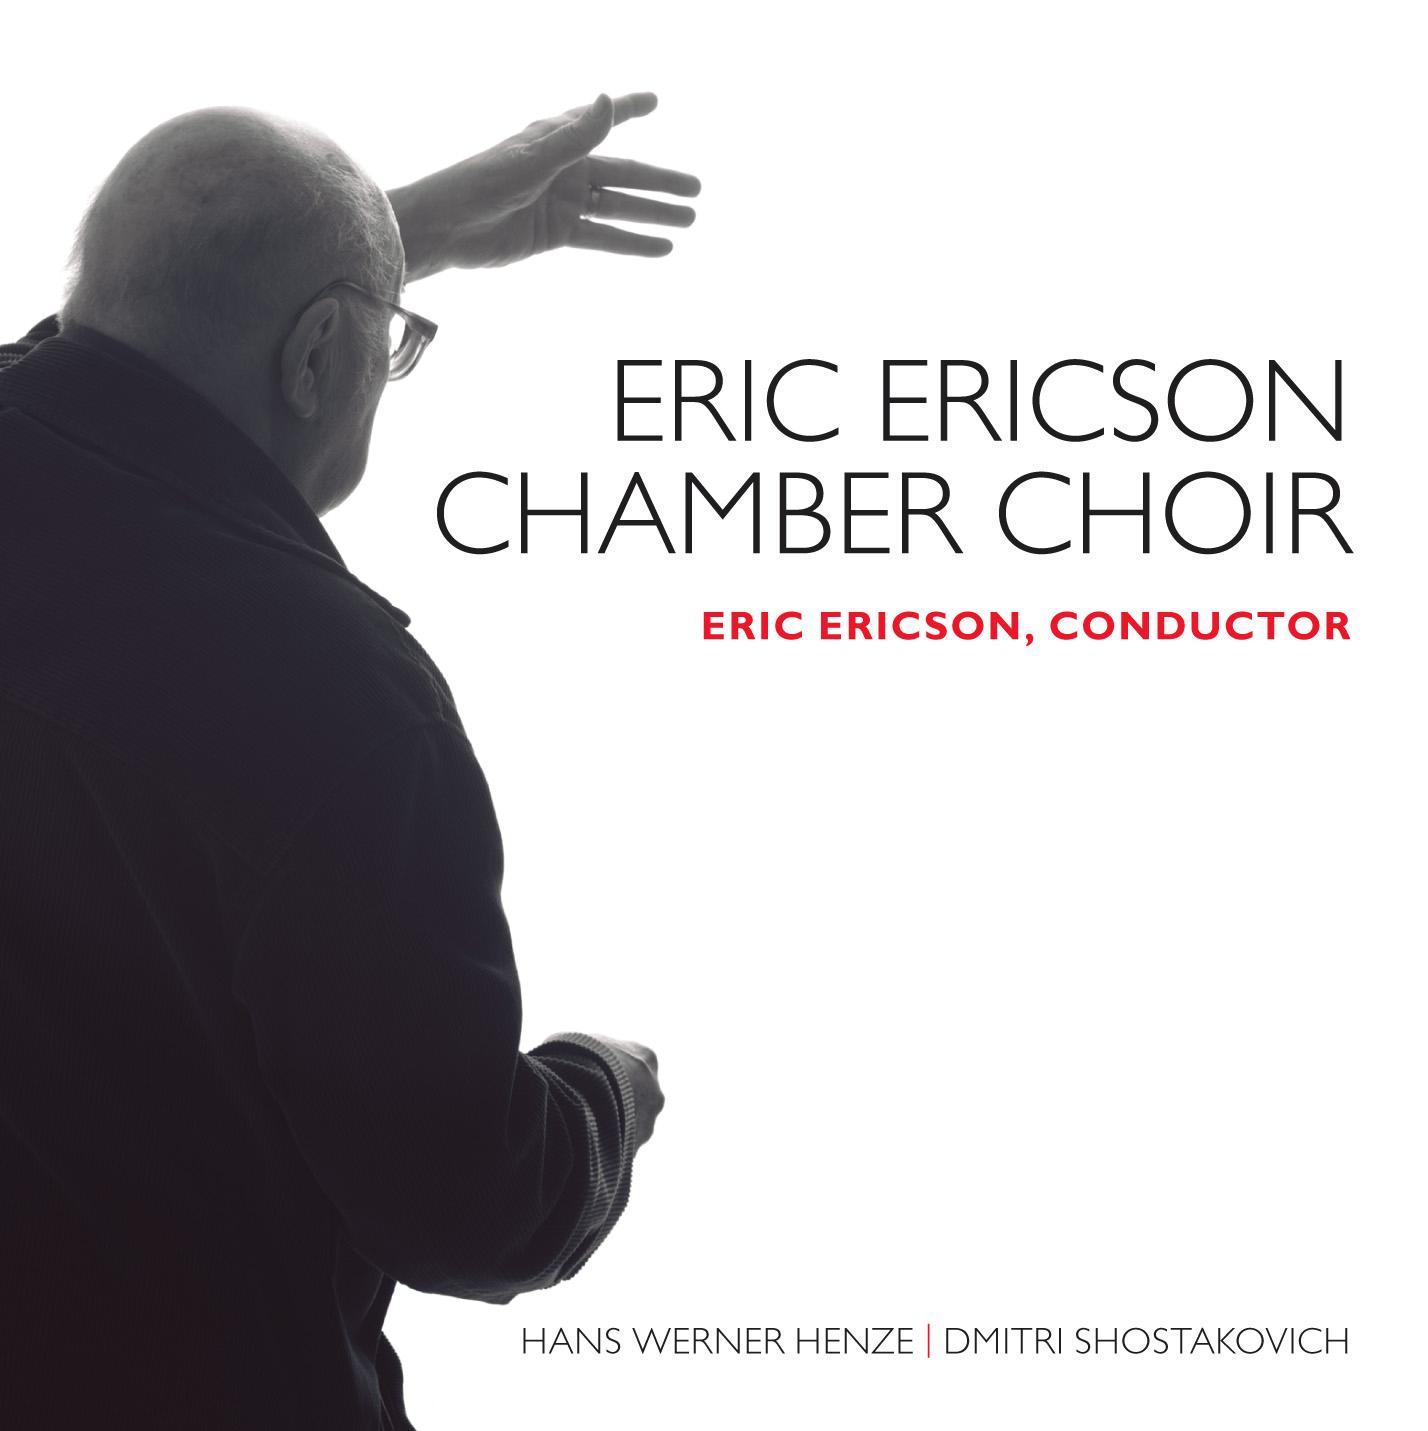 Eric Ericson Chamber Choir